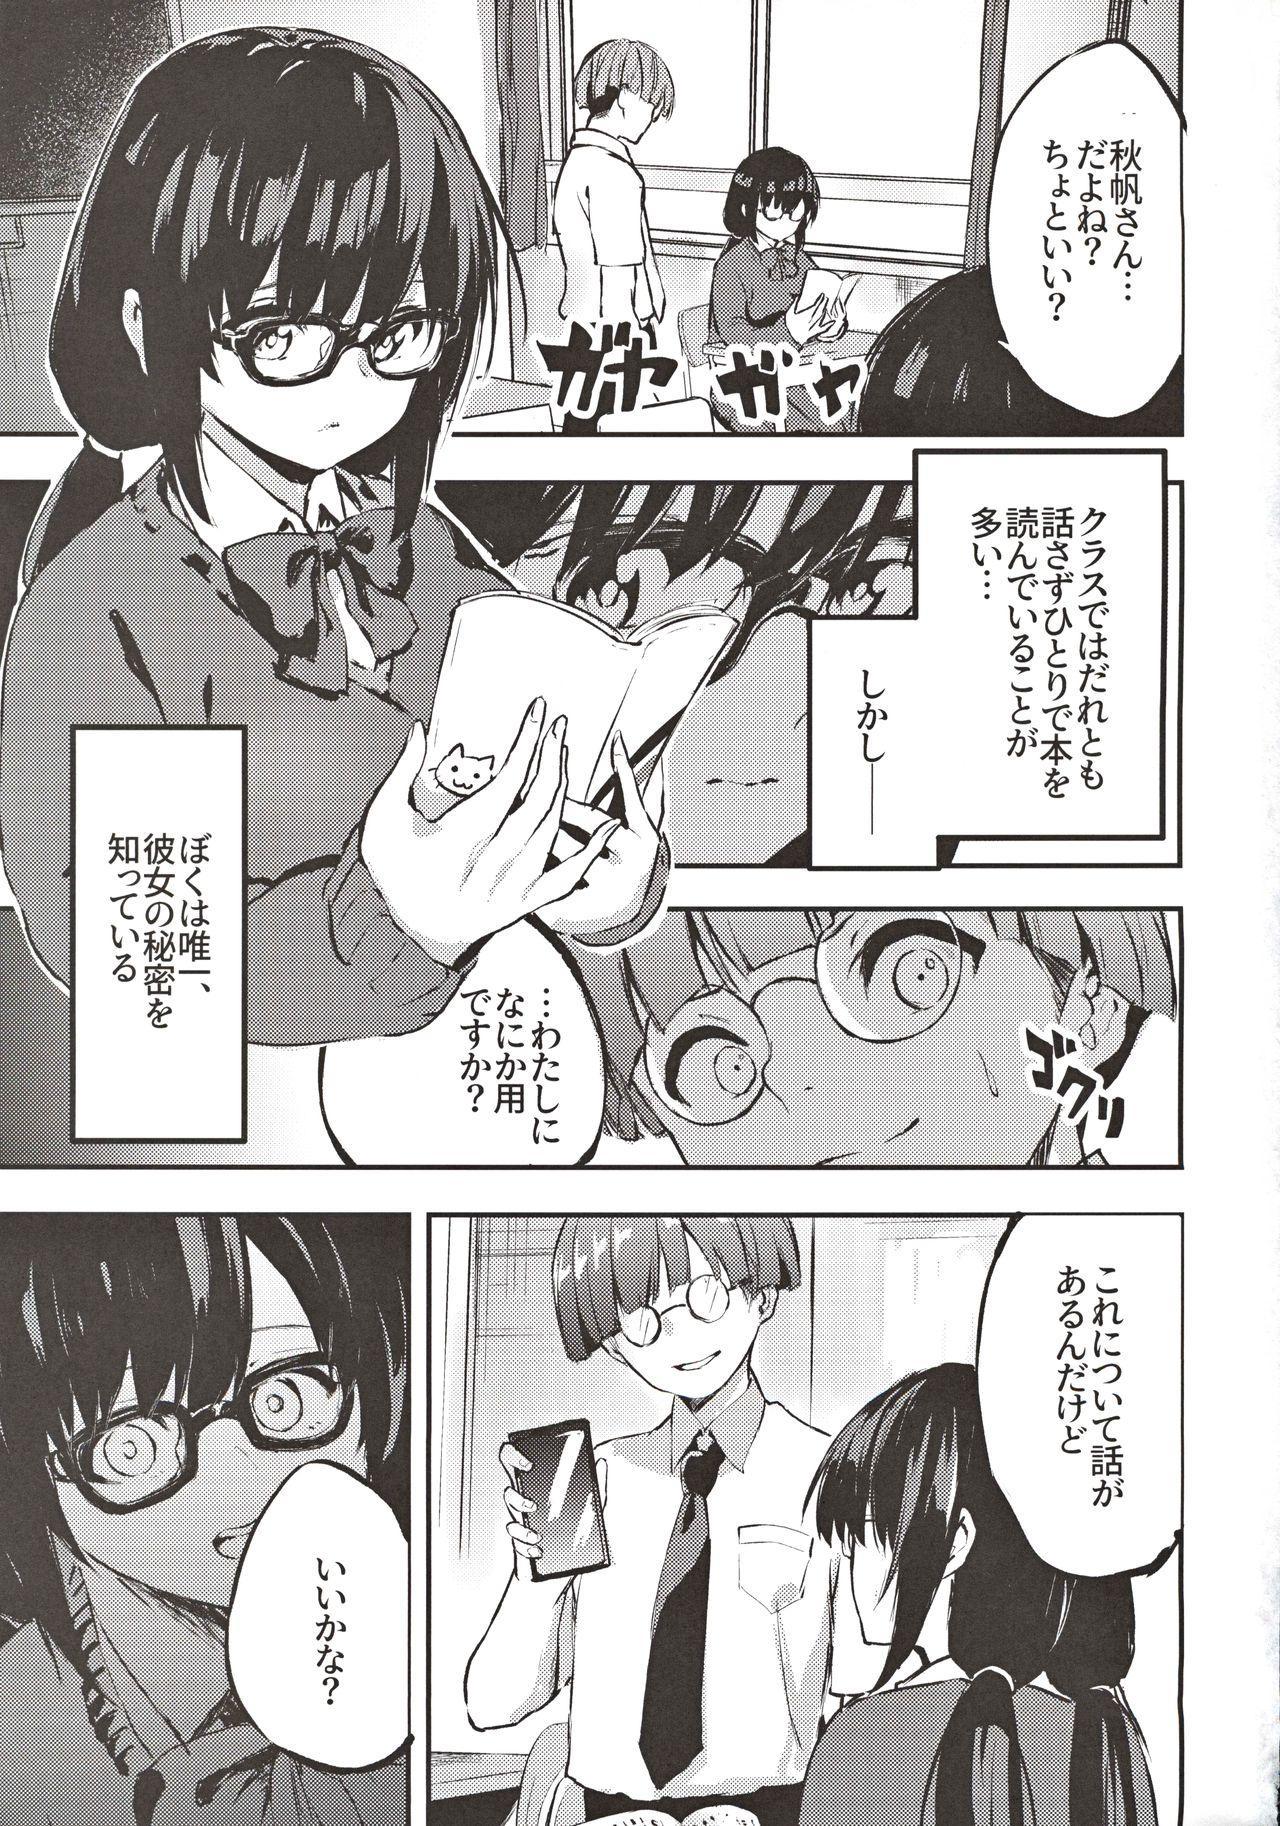 Jimiko no Cosplay Ura Aka Jijou 1